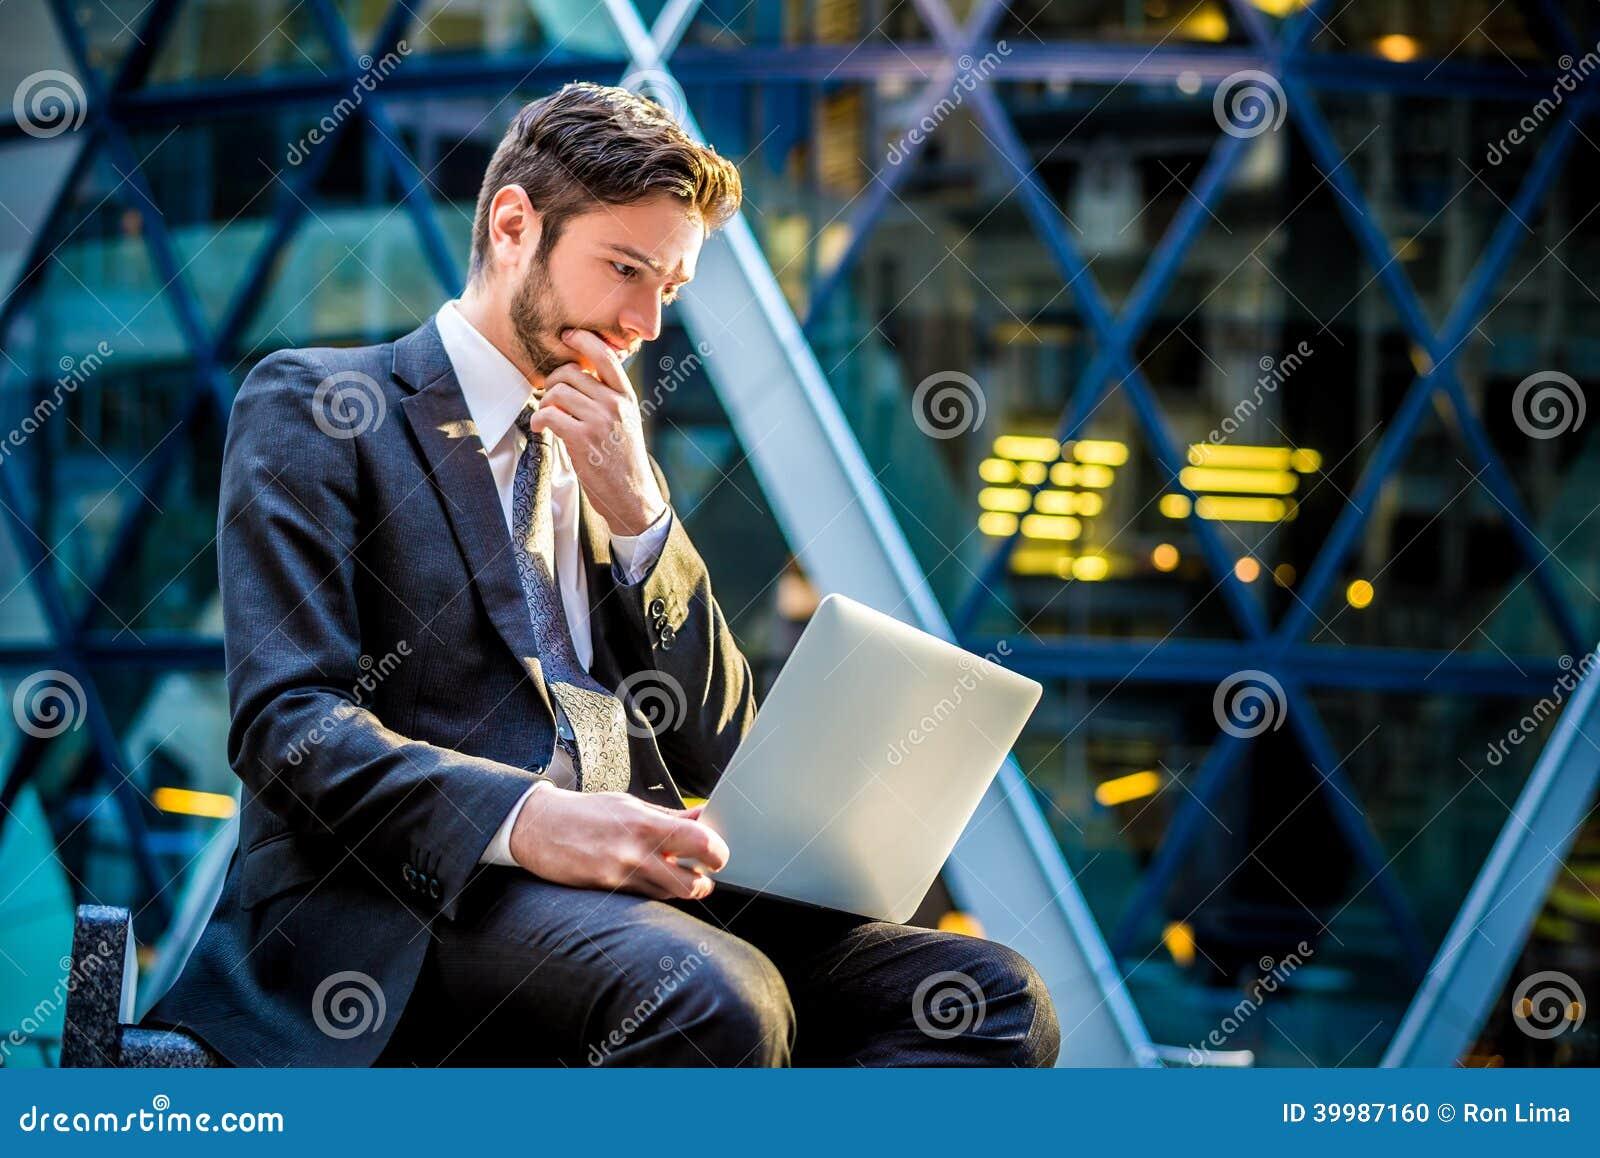 Worried businessman on laptop computer